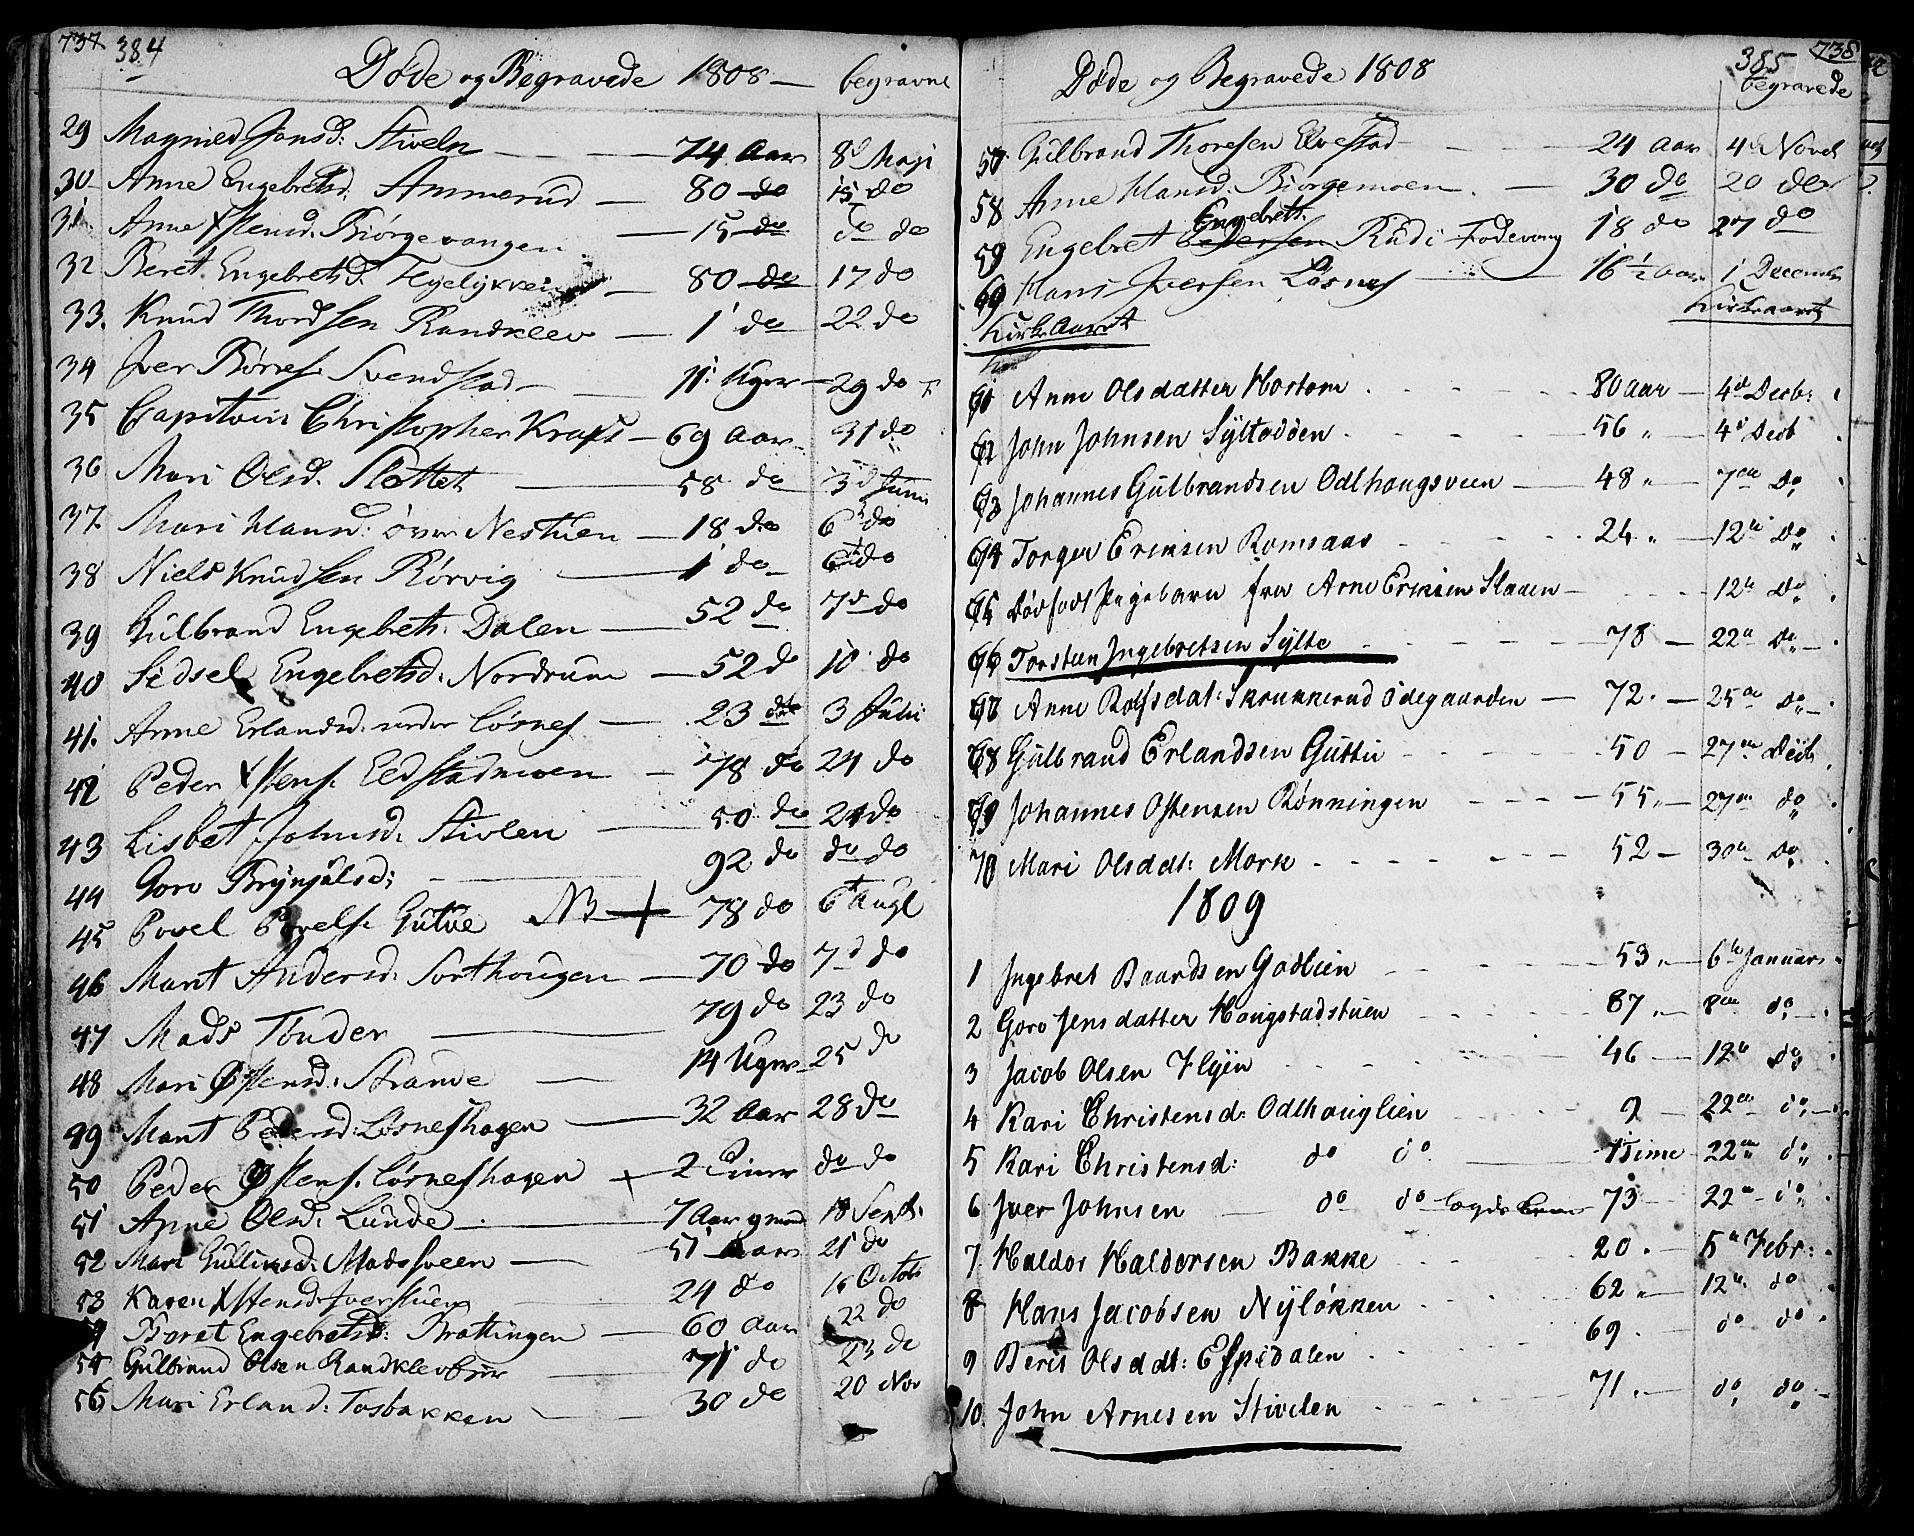 SAH, Ringebu prestekontor, Ministerialbok nr. 3, 1781-1820, s. 384-385